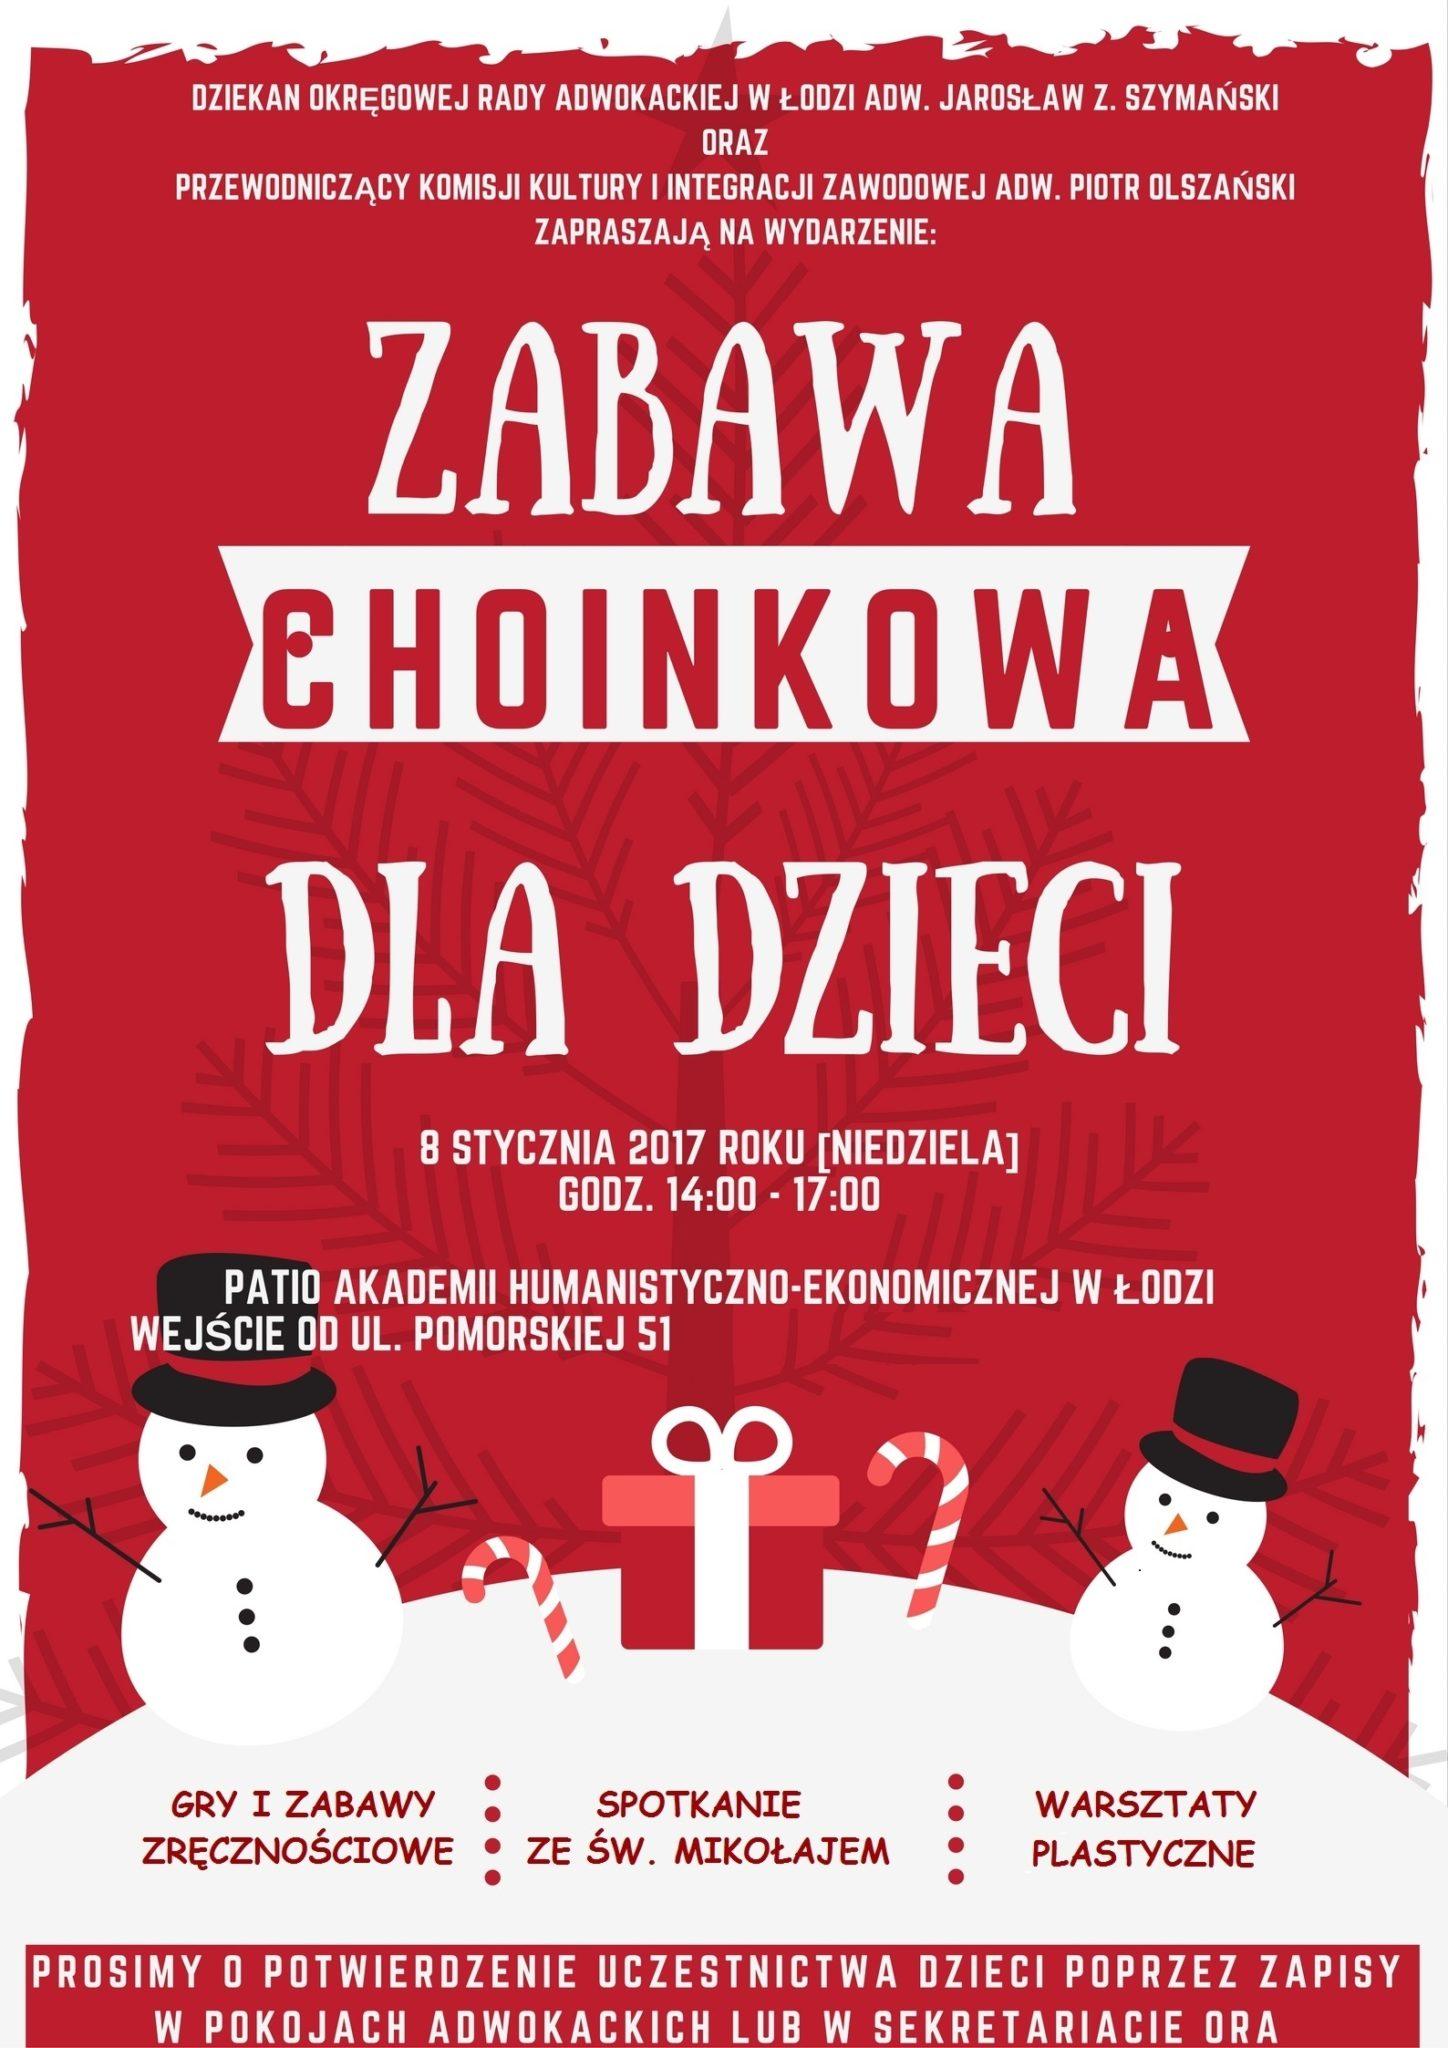 http://lodz.adwokatura.pl/wp-content/uploads/2019/04/file-plakat-1-2627.jpg